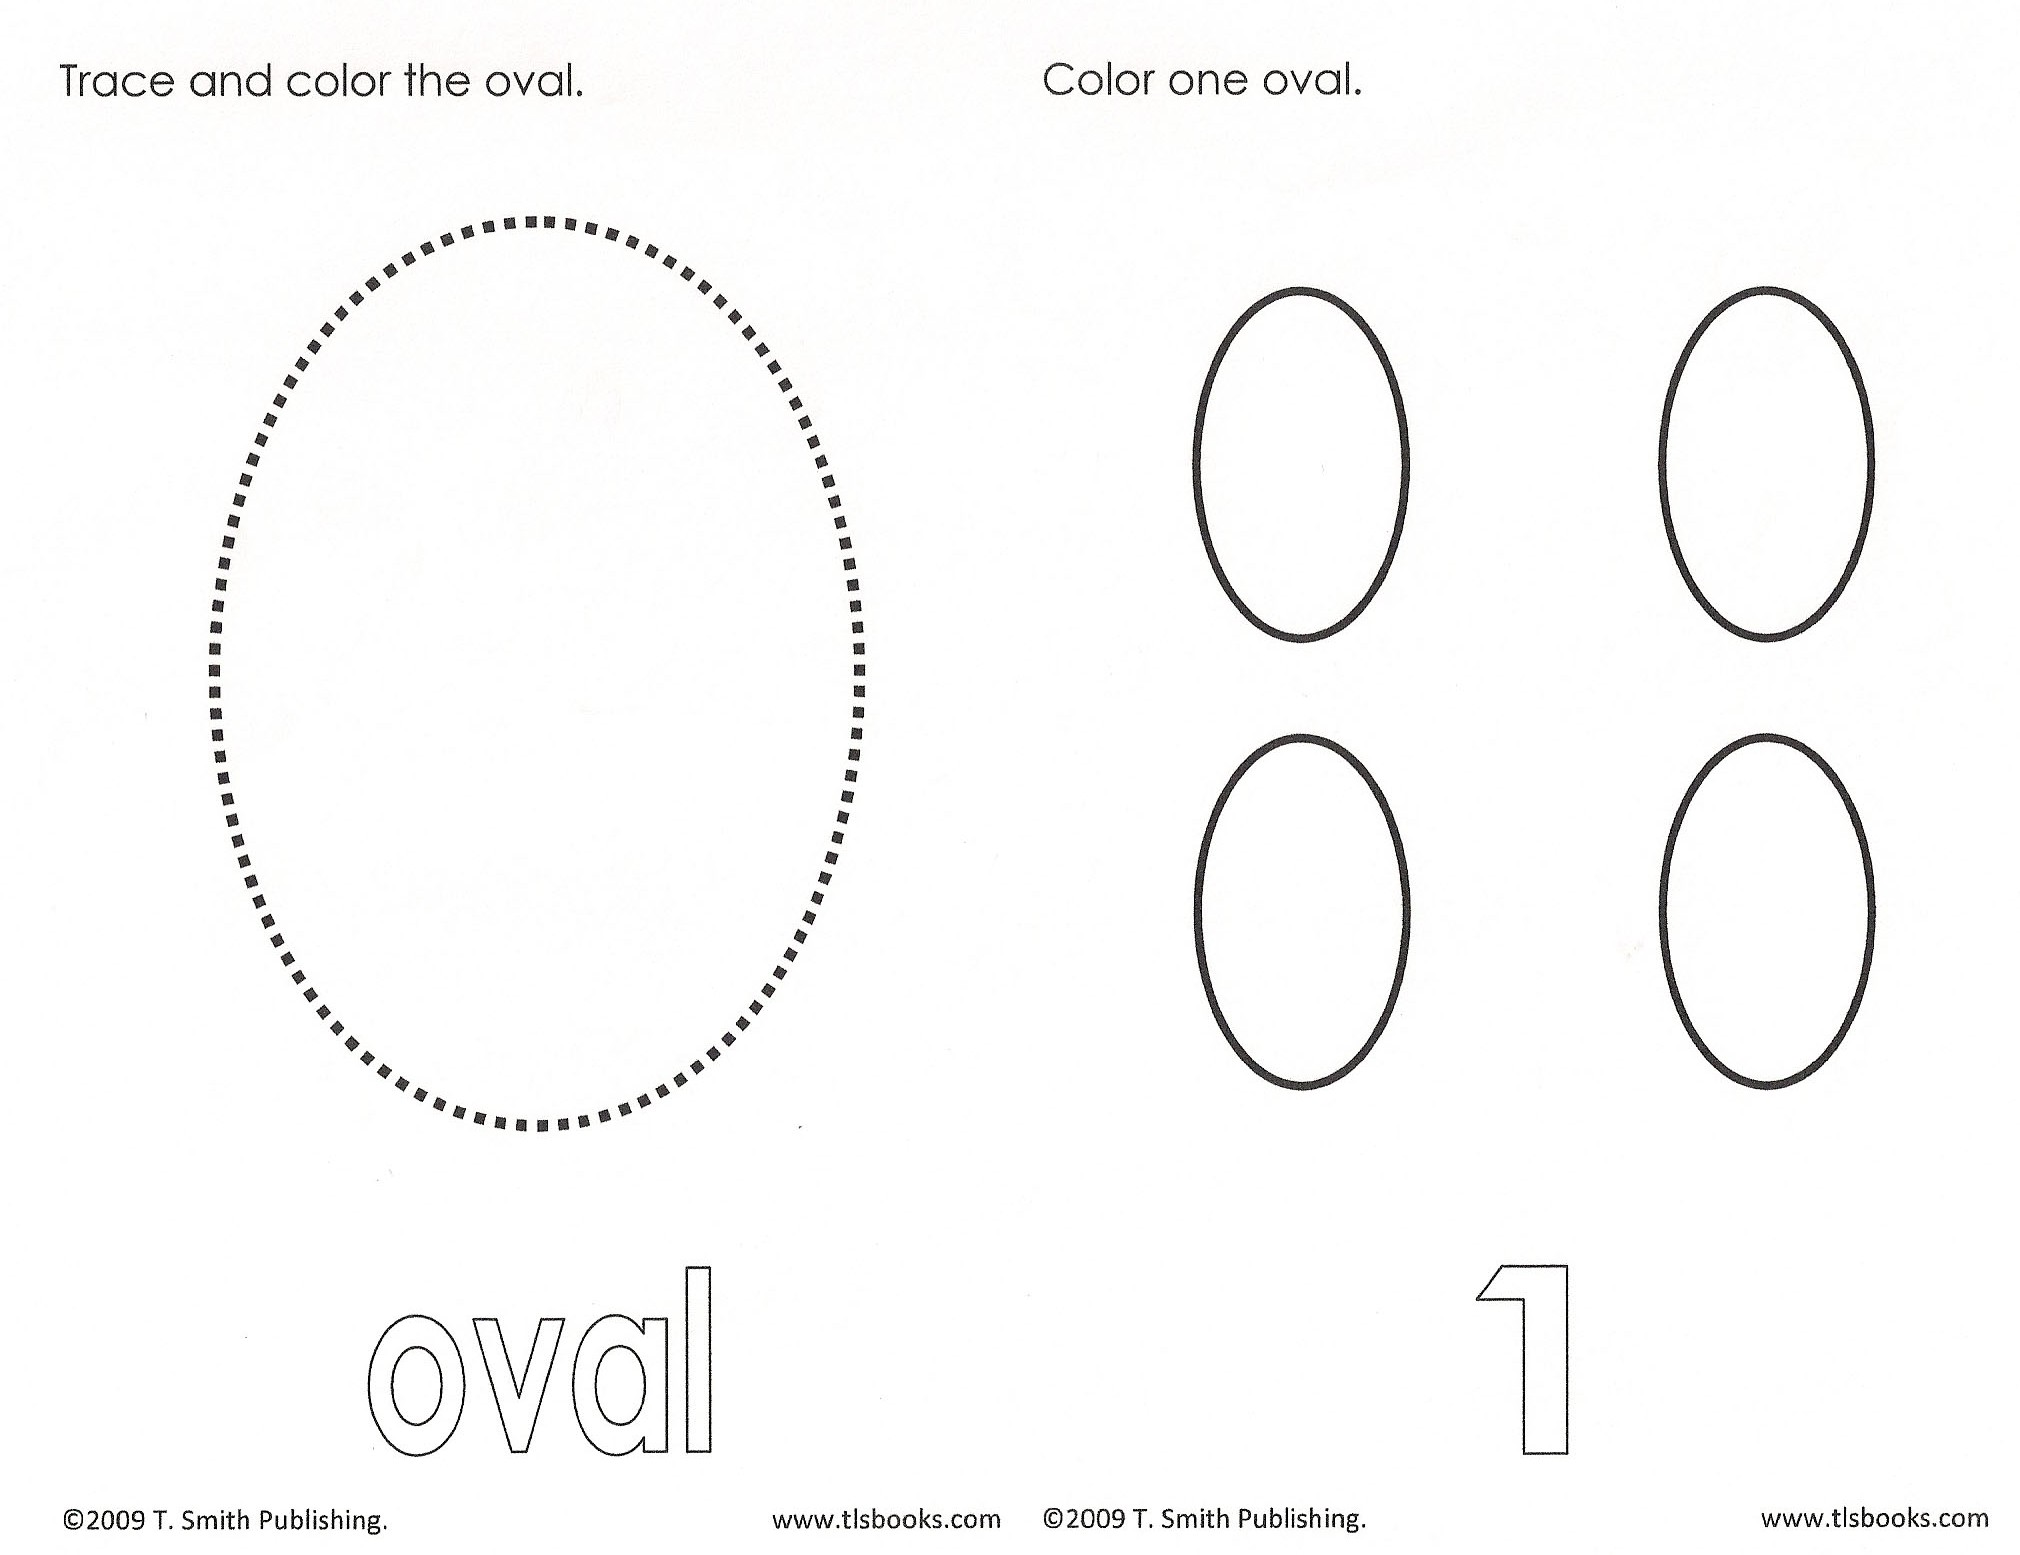 Colorful Oval Shape Tracing Worksheet Free Pre K Worksheets 12